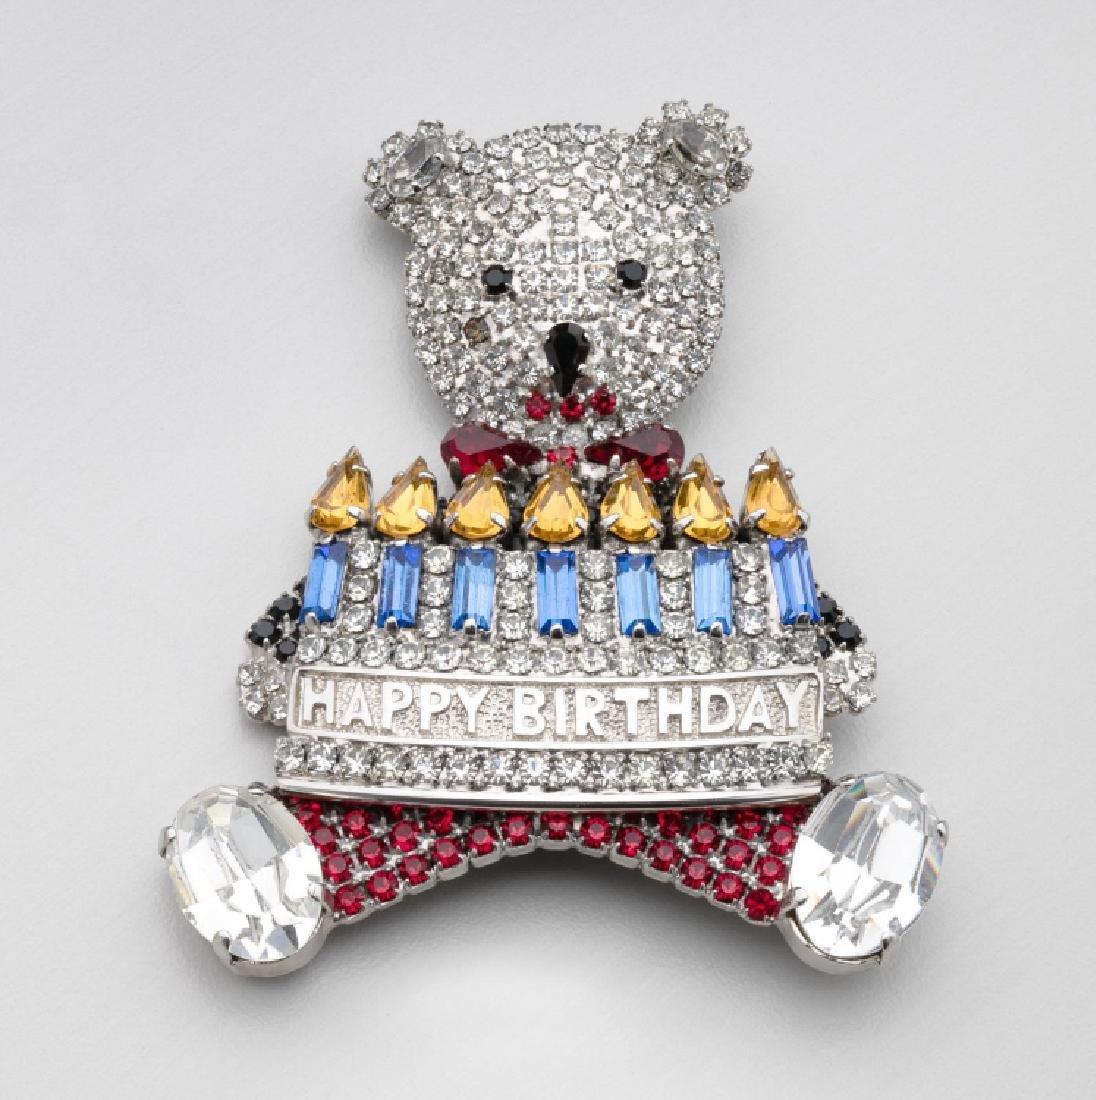 BUTLER & WILSON RHINESTONE HAPPY BIRTHDAY BEAR BROOCH